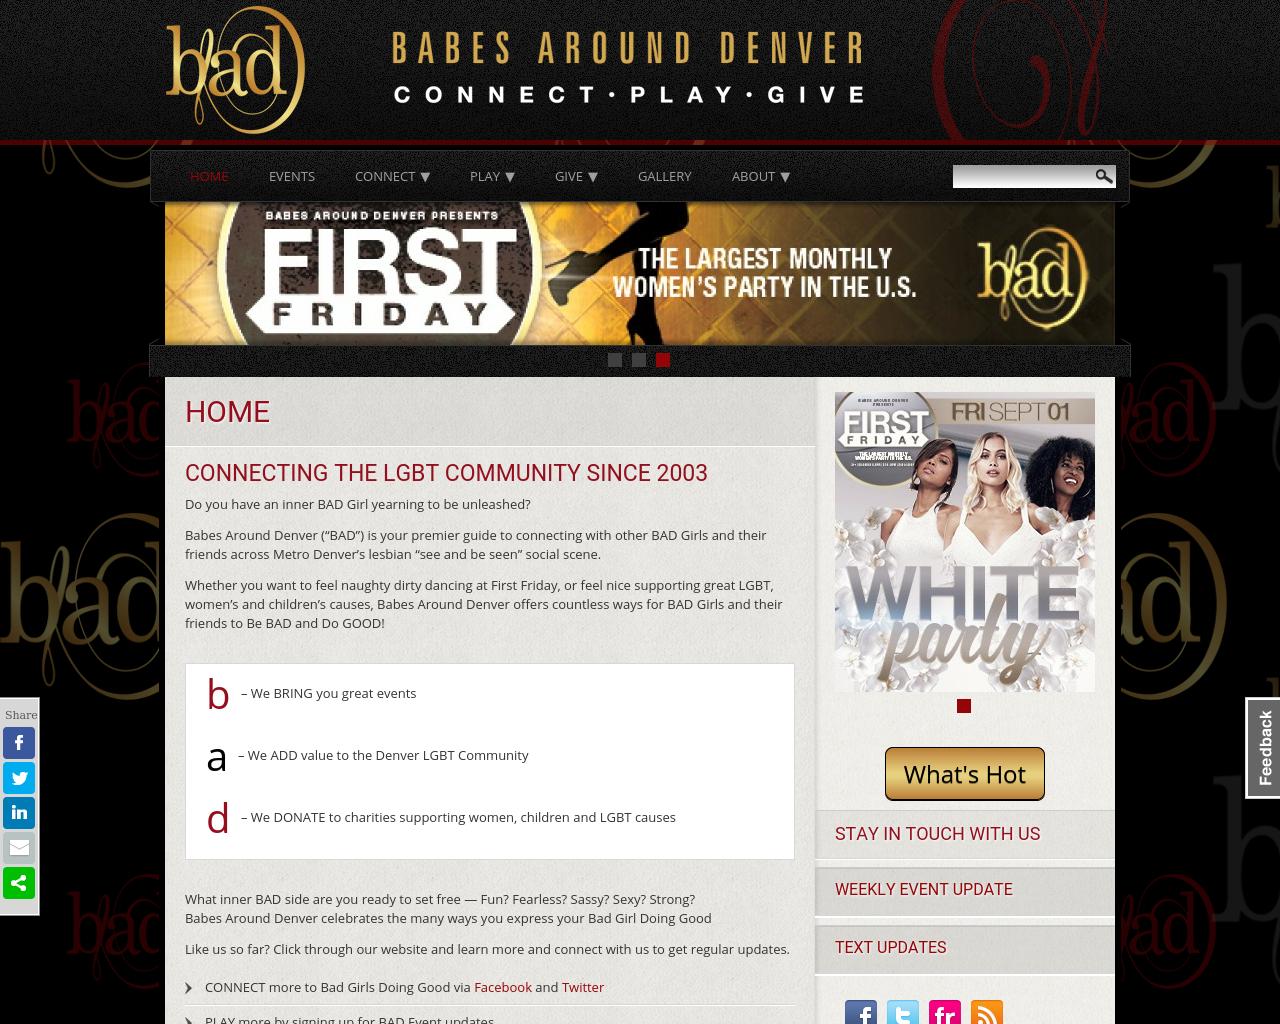 Babes-Around-Denver-Advertising-Reviews-Pricing